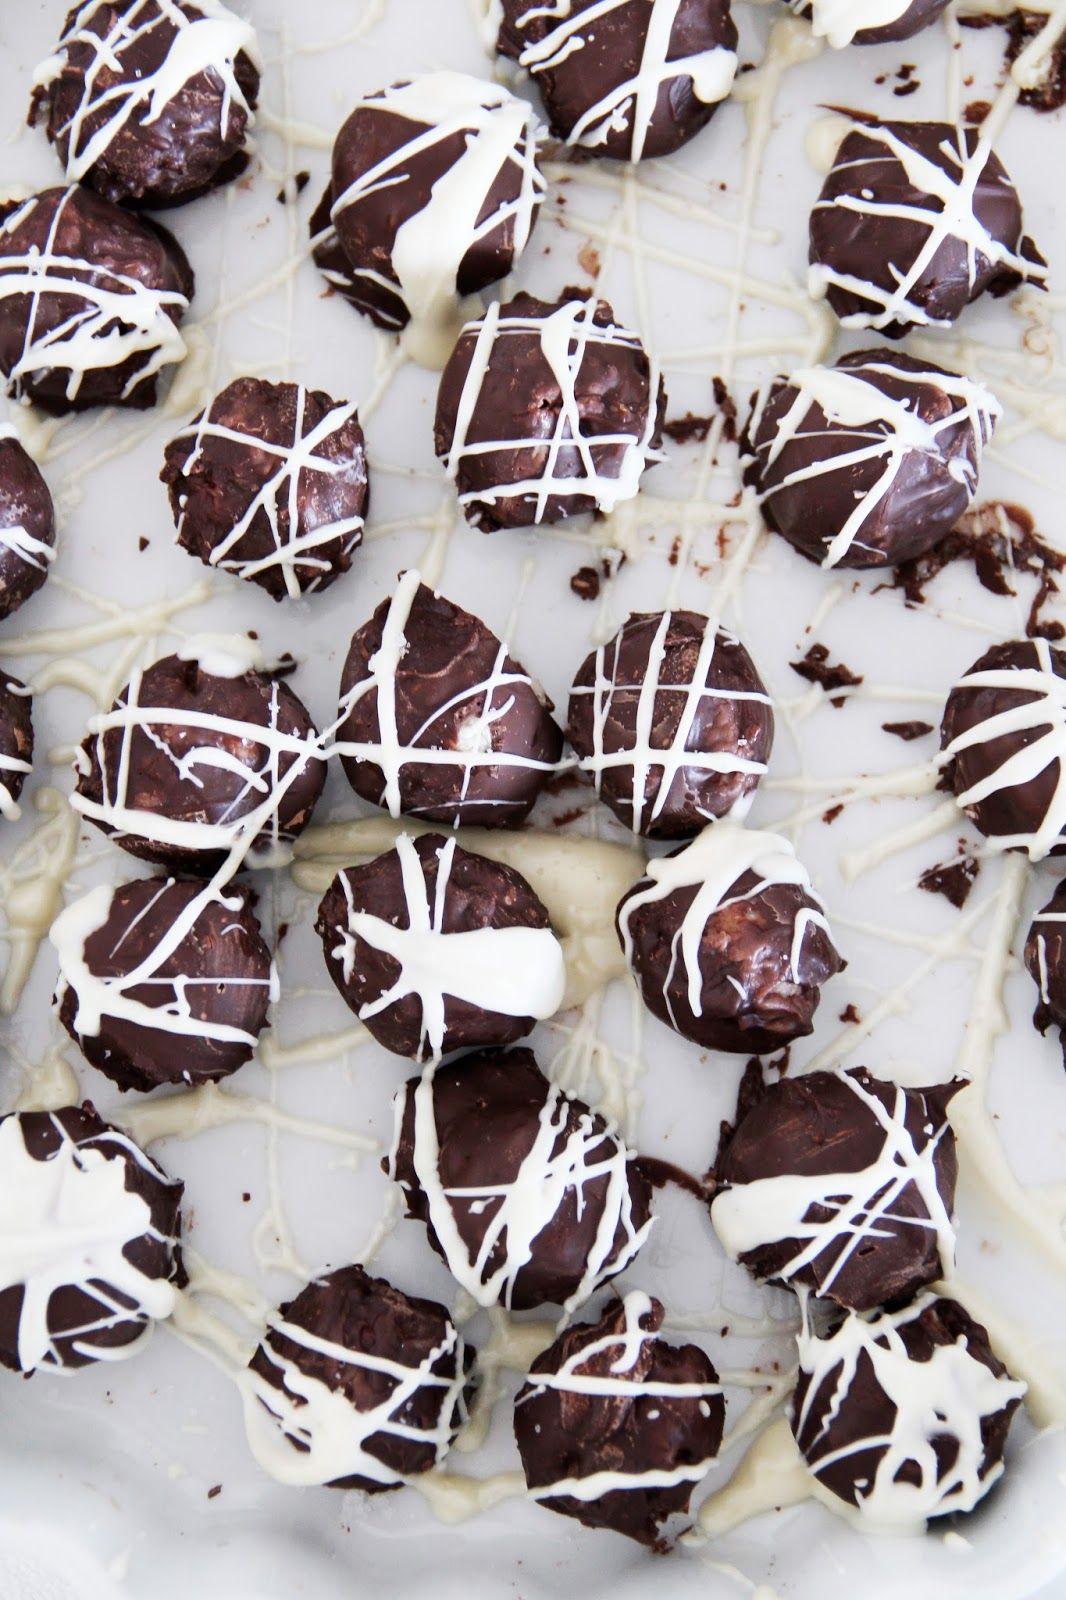 truffes-handgemacht-rezept-weisse-schoggi-kokos